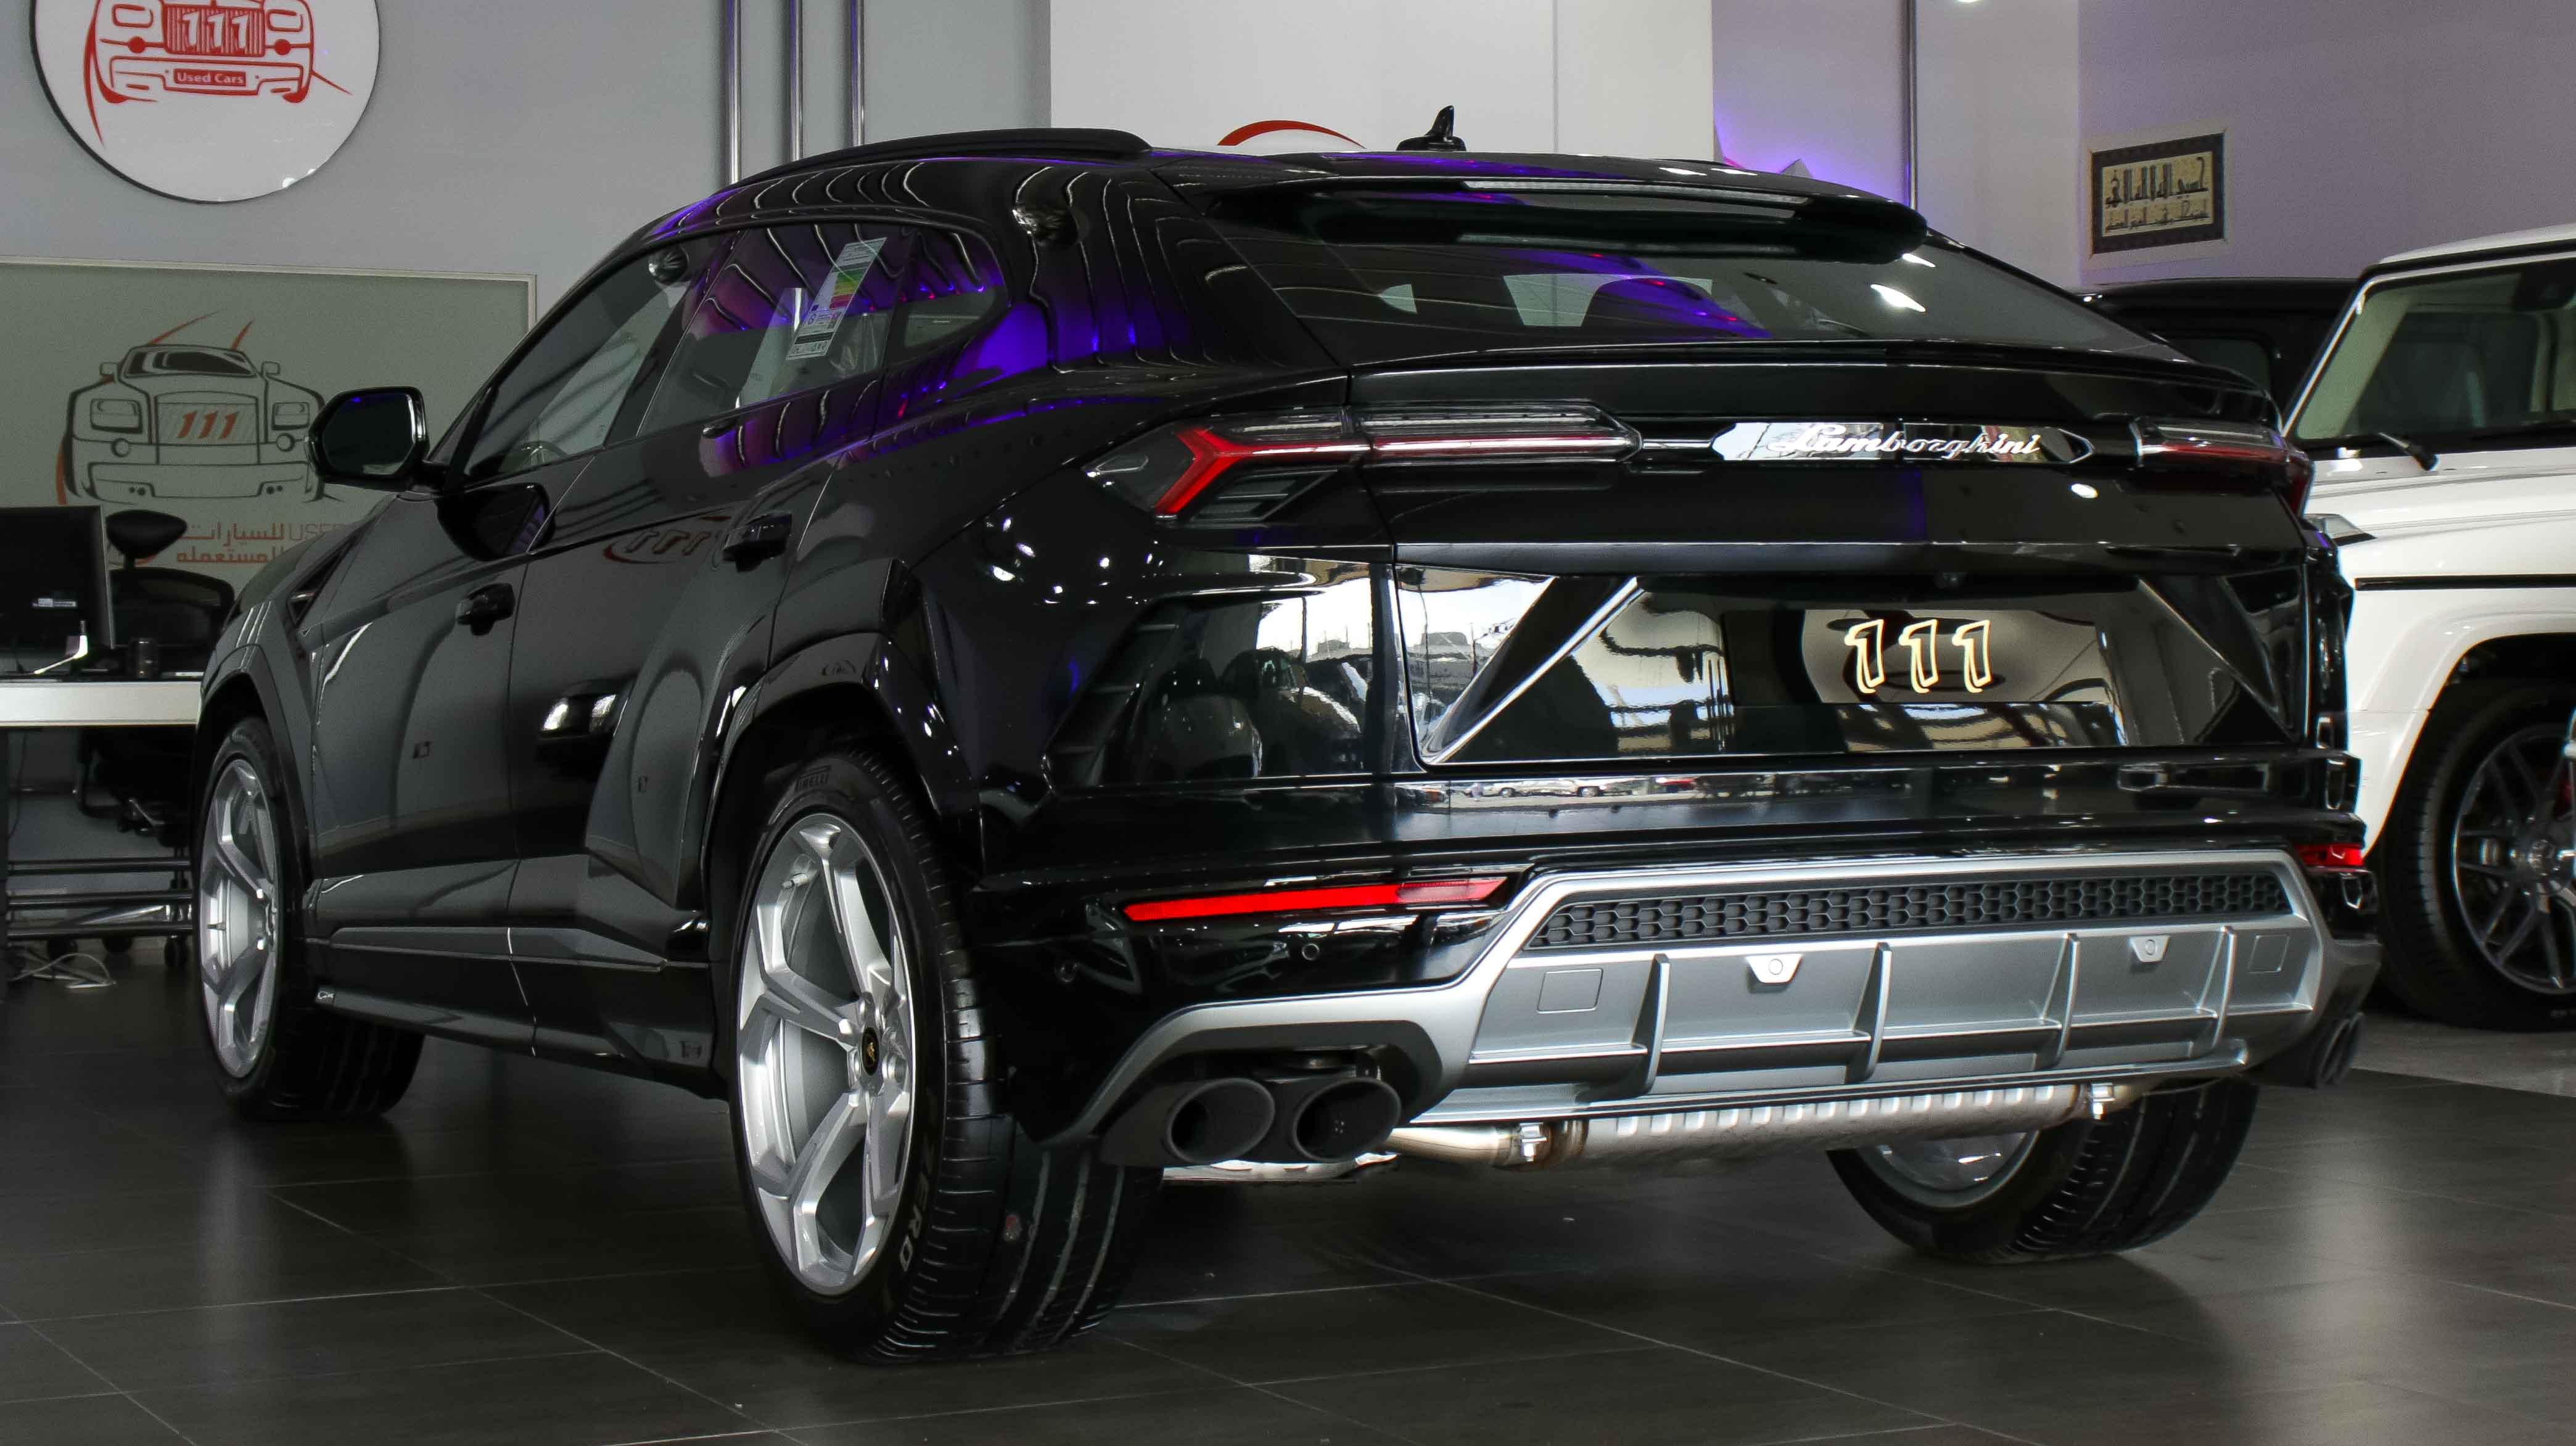 2019 Lamborghini Urus Brand New Gcc Specs 3 Years Warranty